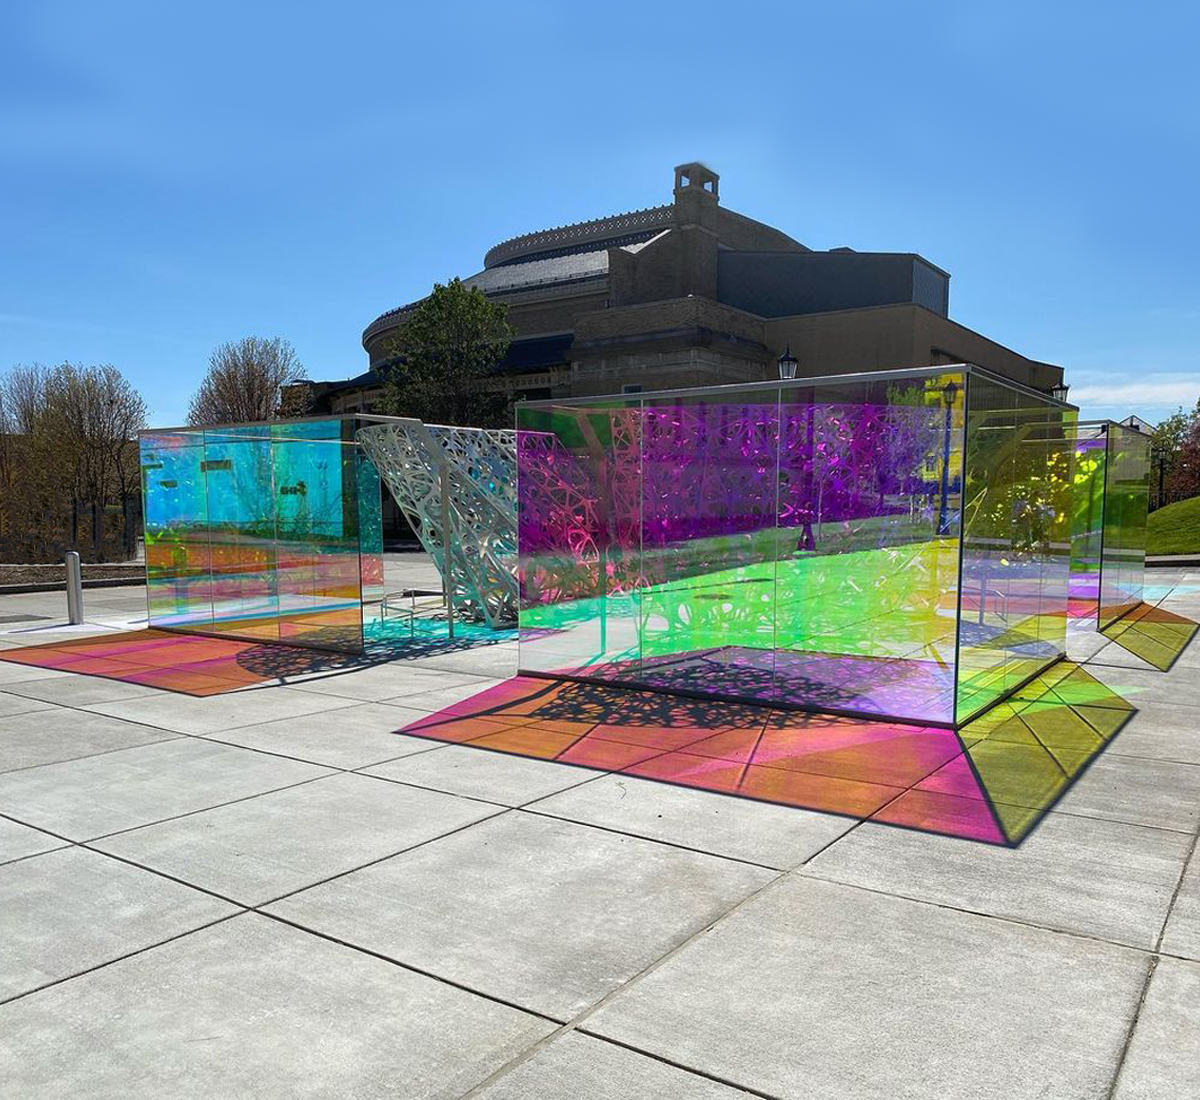 Multicolored glass boxes reflecting multicolored light onto concrete.